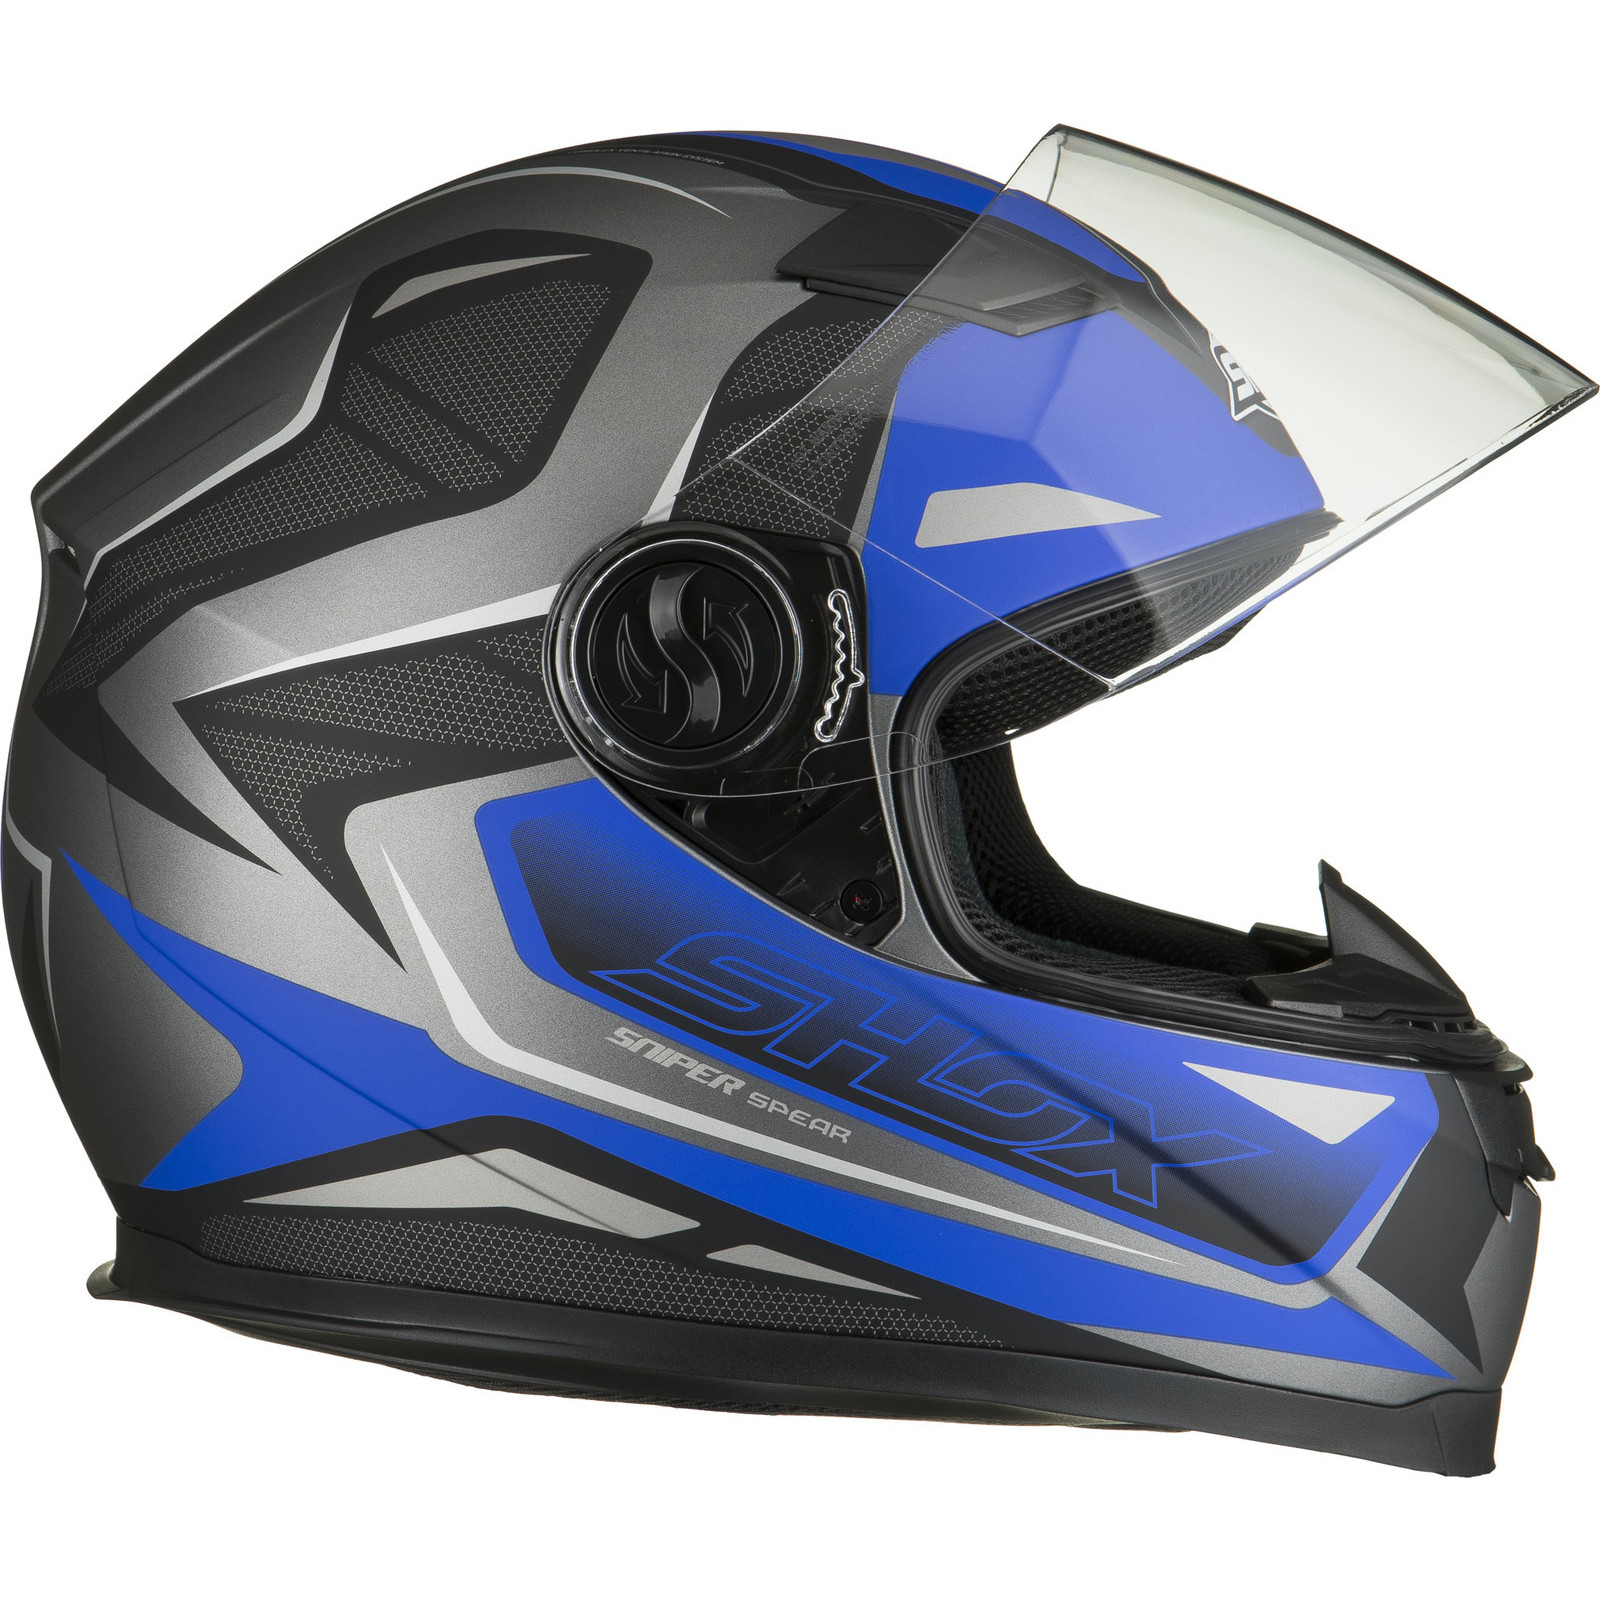 Shox Sniper Spear Full Face Motorbike Motorcycle Scooter Bike Helmet Ghostbikes